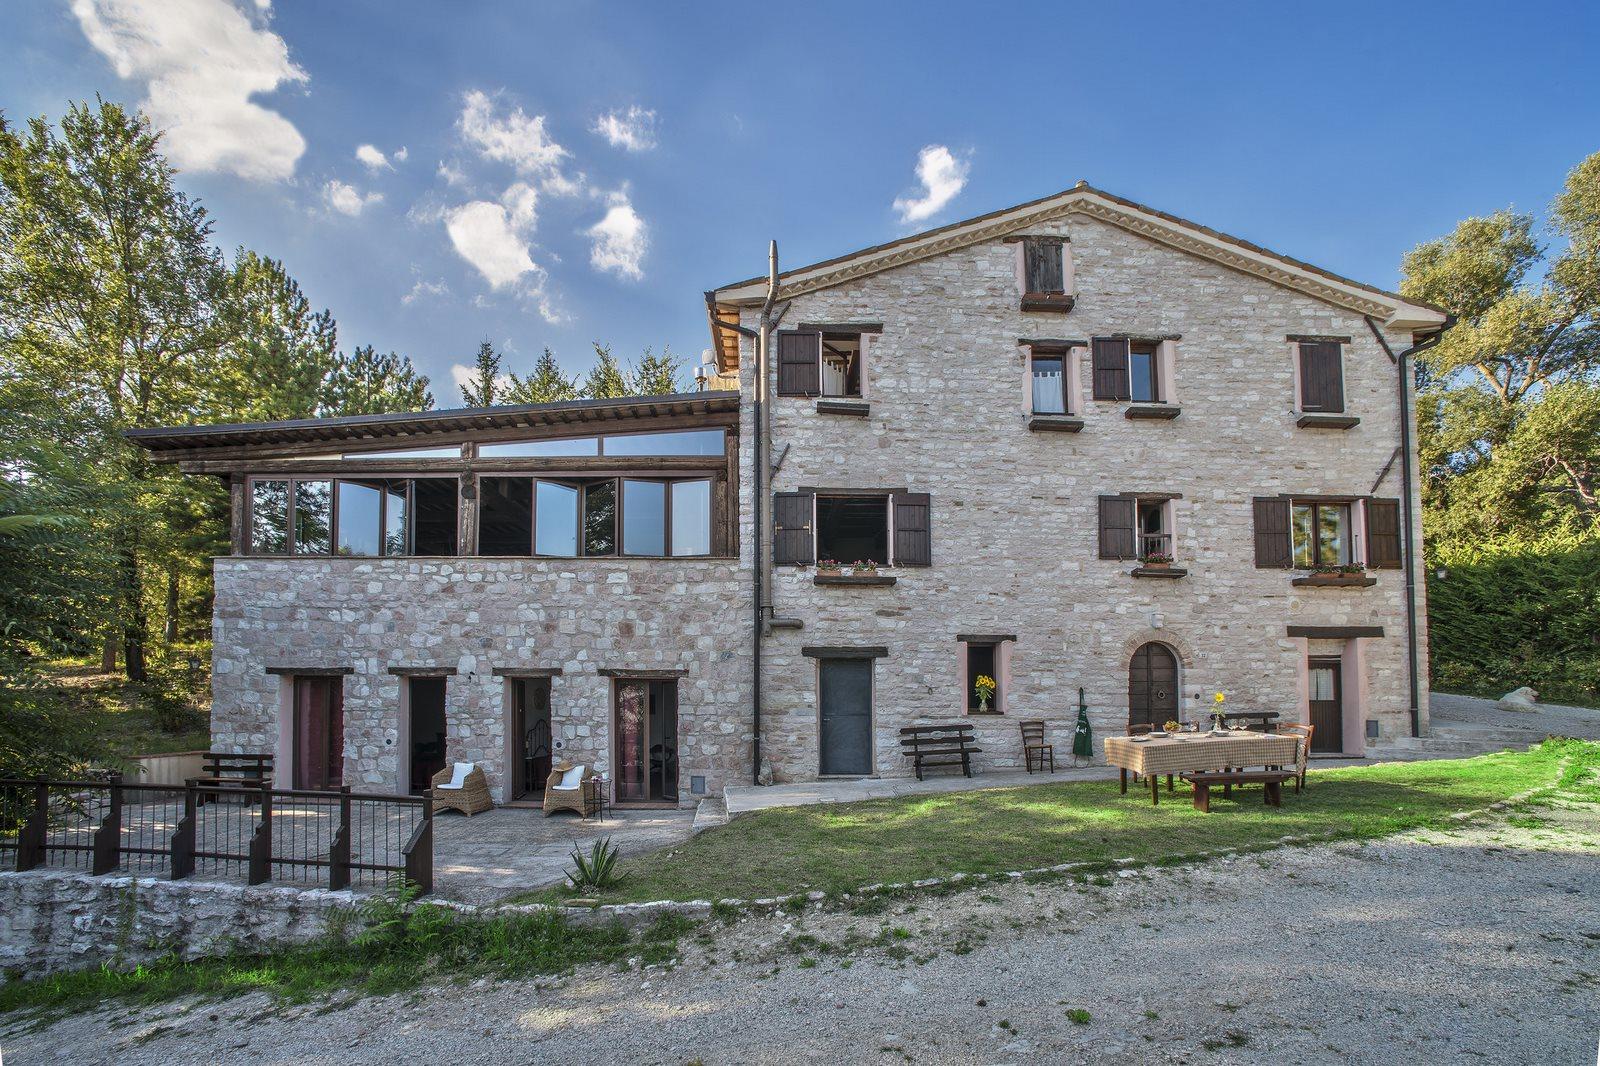 Ferienhaus La Quiete dei Re (2236092), Cagli, Pesaro und Urbino, Marken, Italien, Bild 2